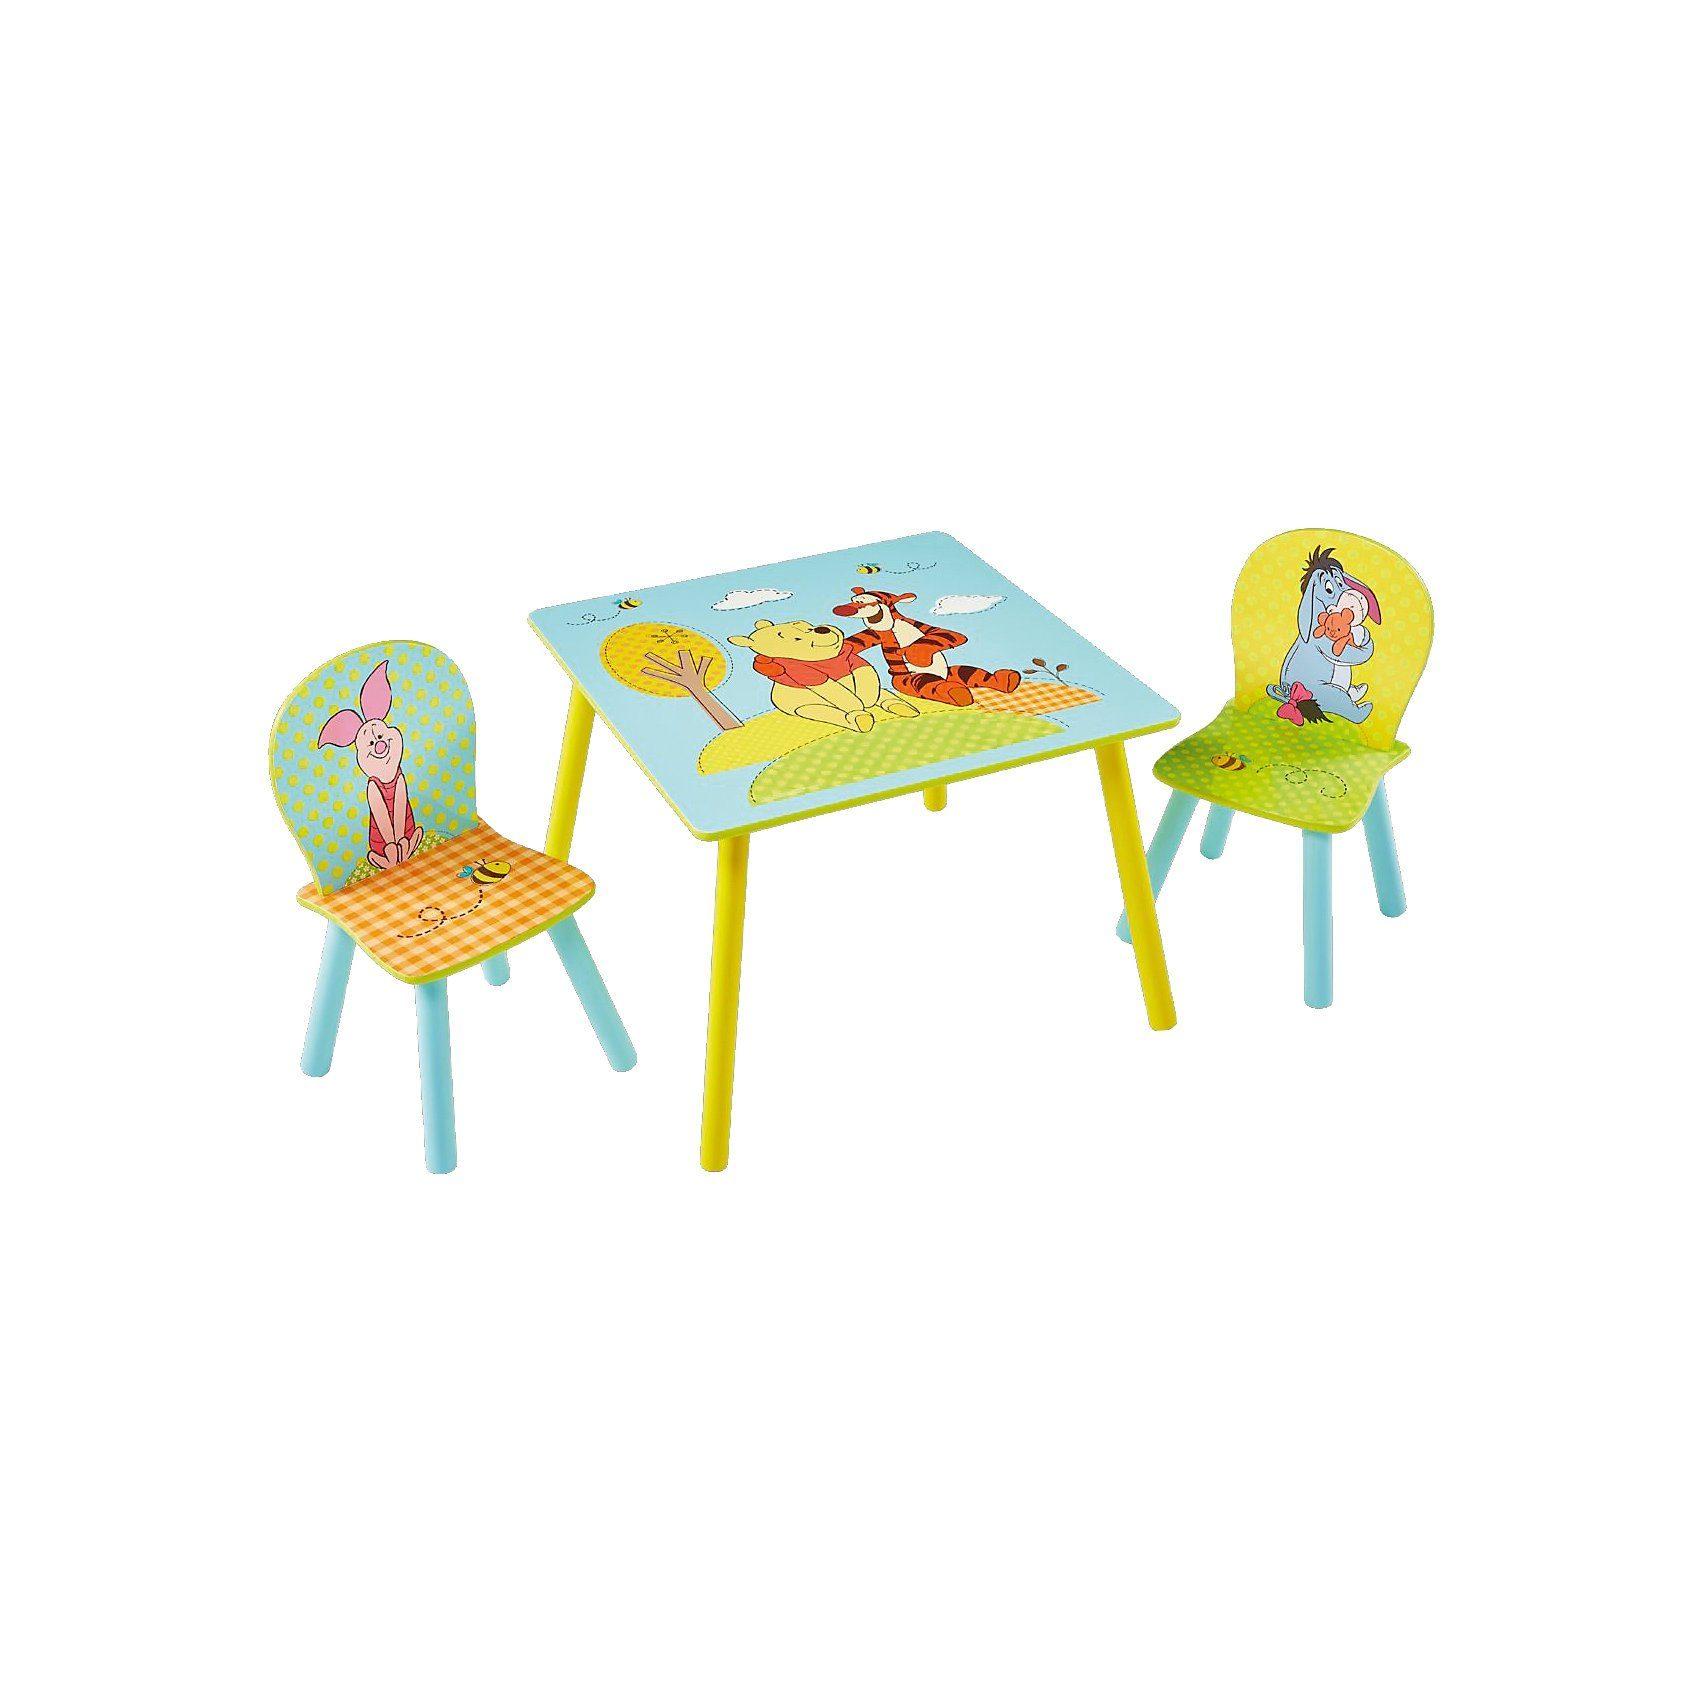 WORLDS APART Kindersitzgruppe 3-tlg., Tigger, Winnie the Pooh